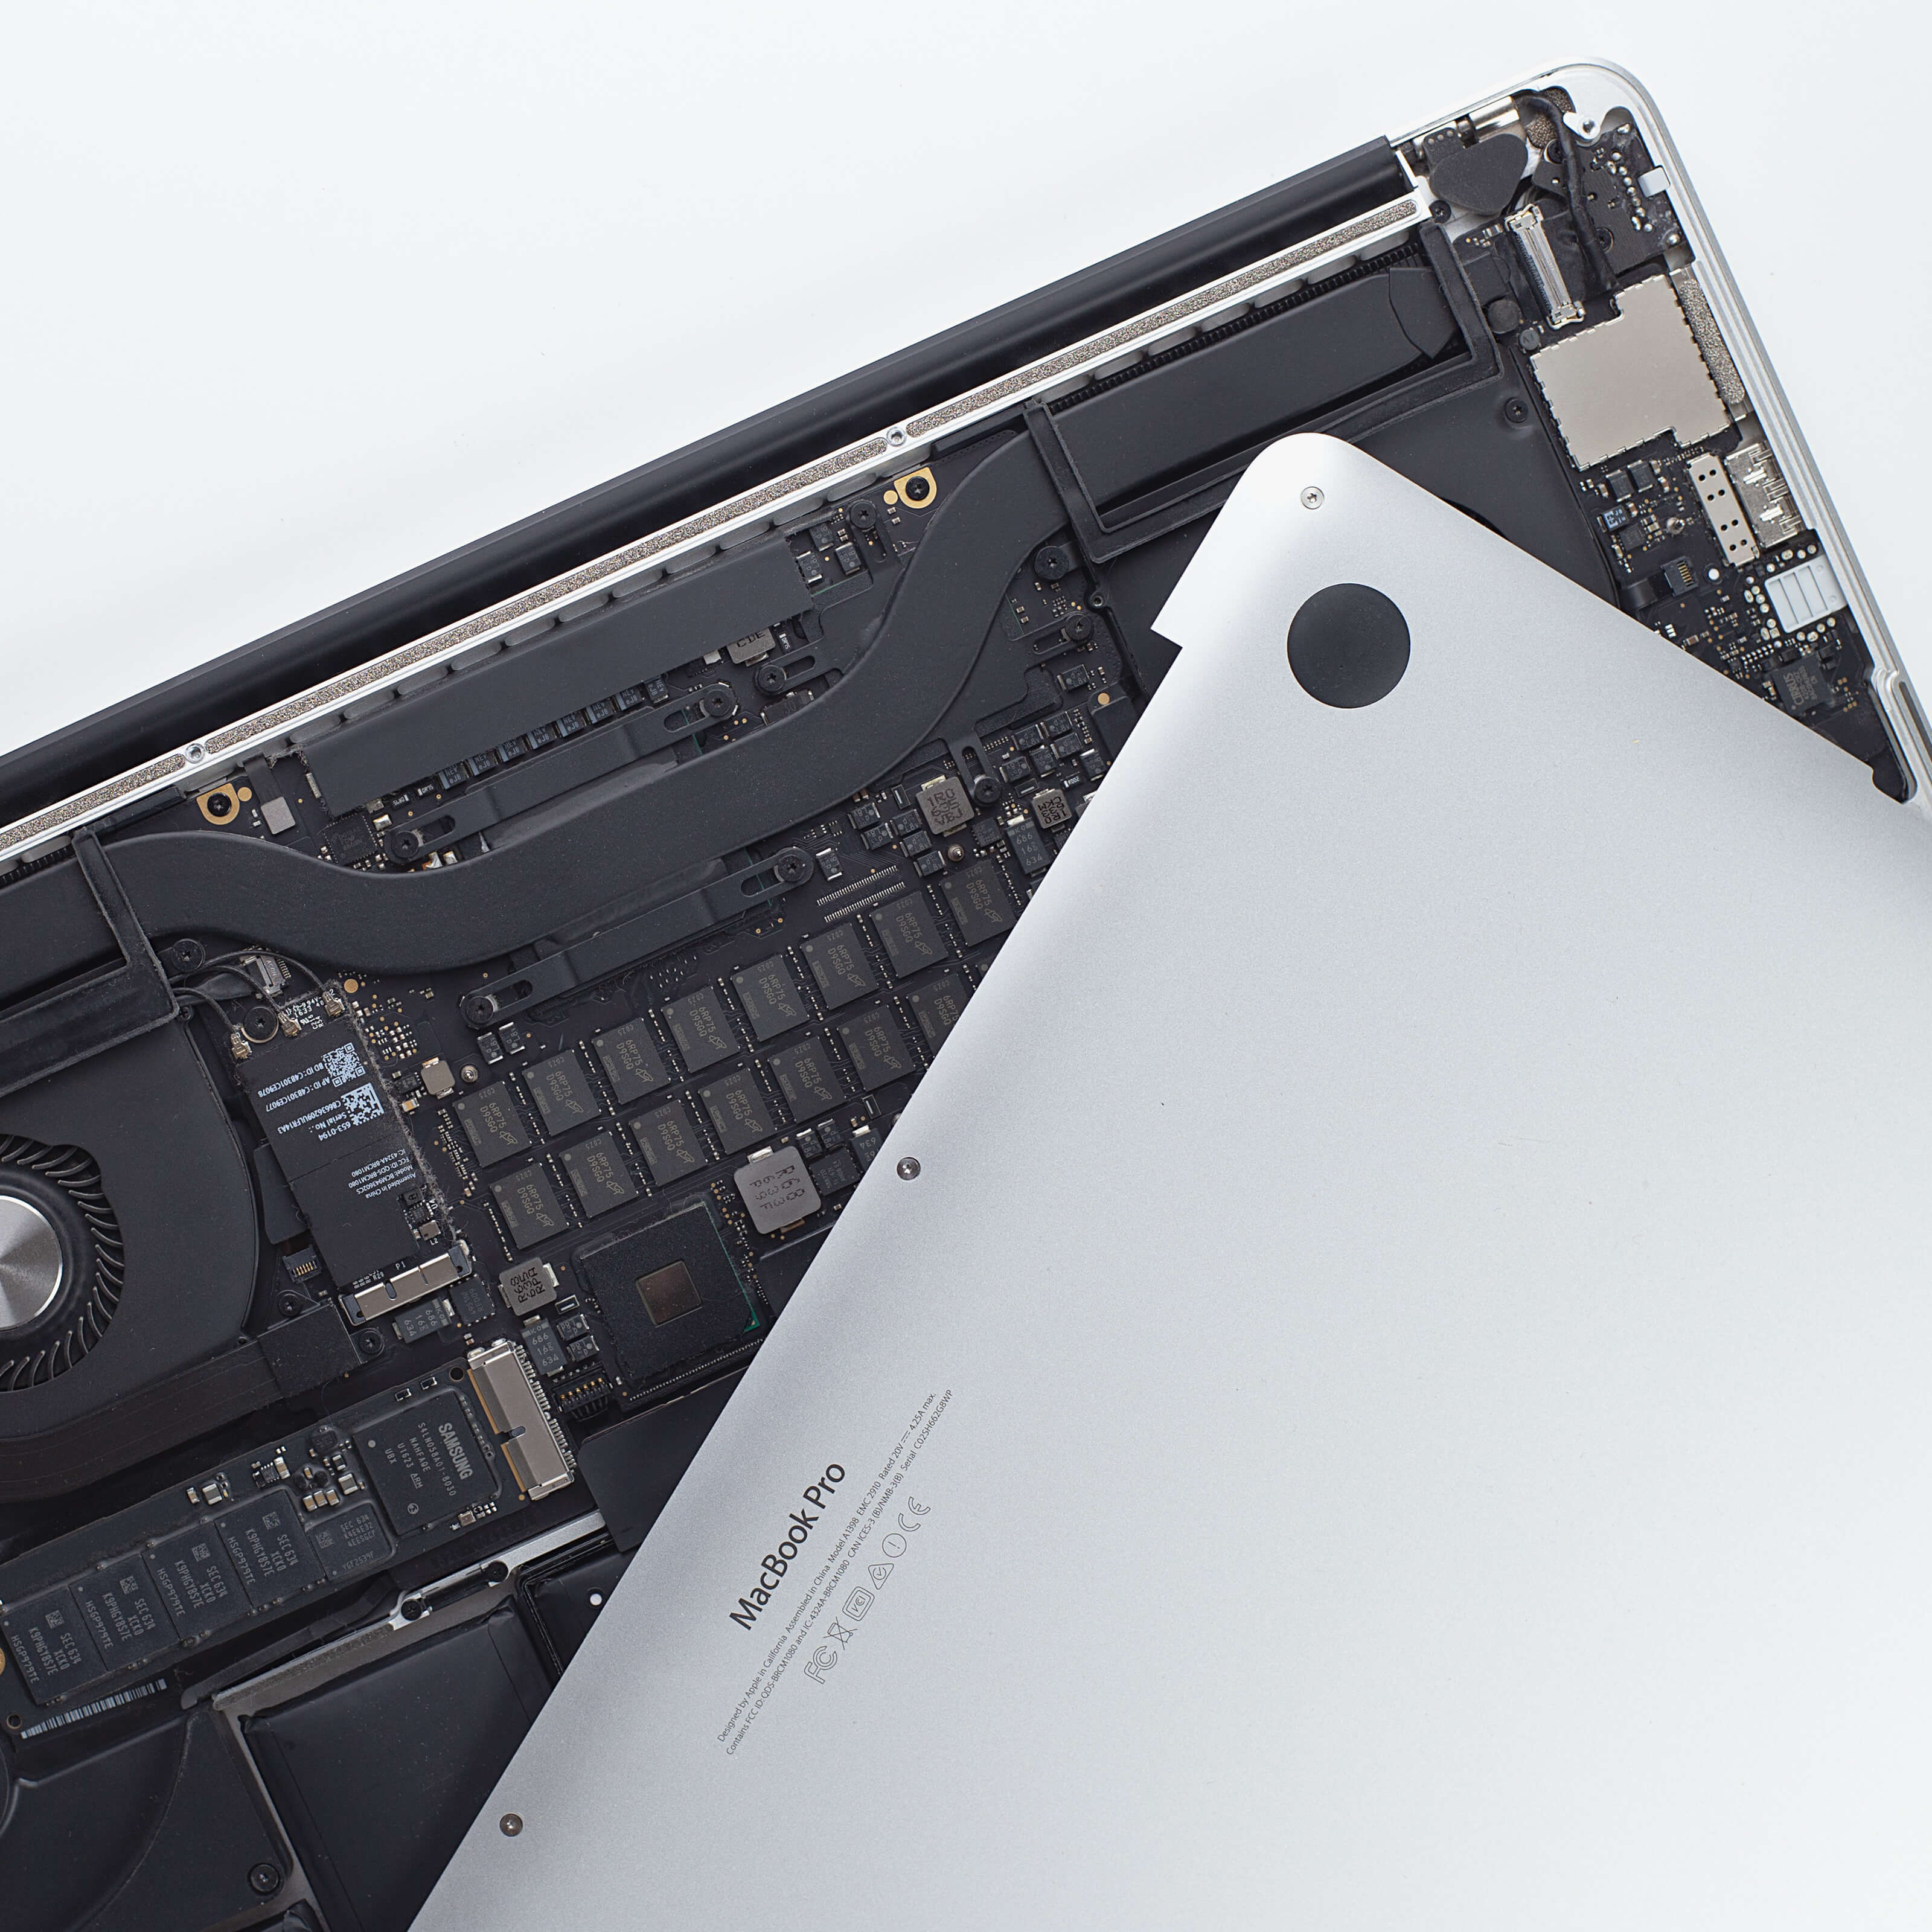 macbook pro circuitboard